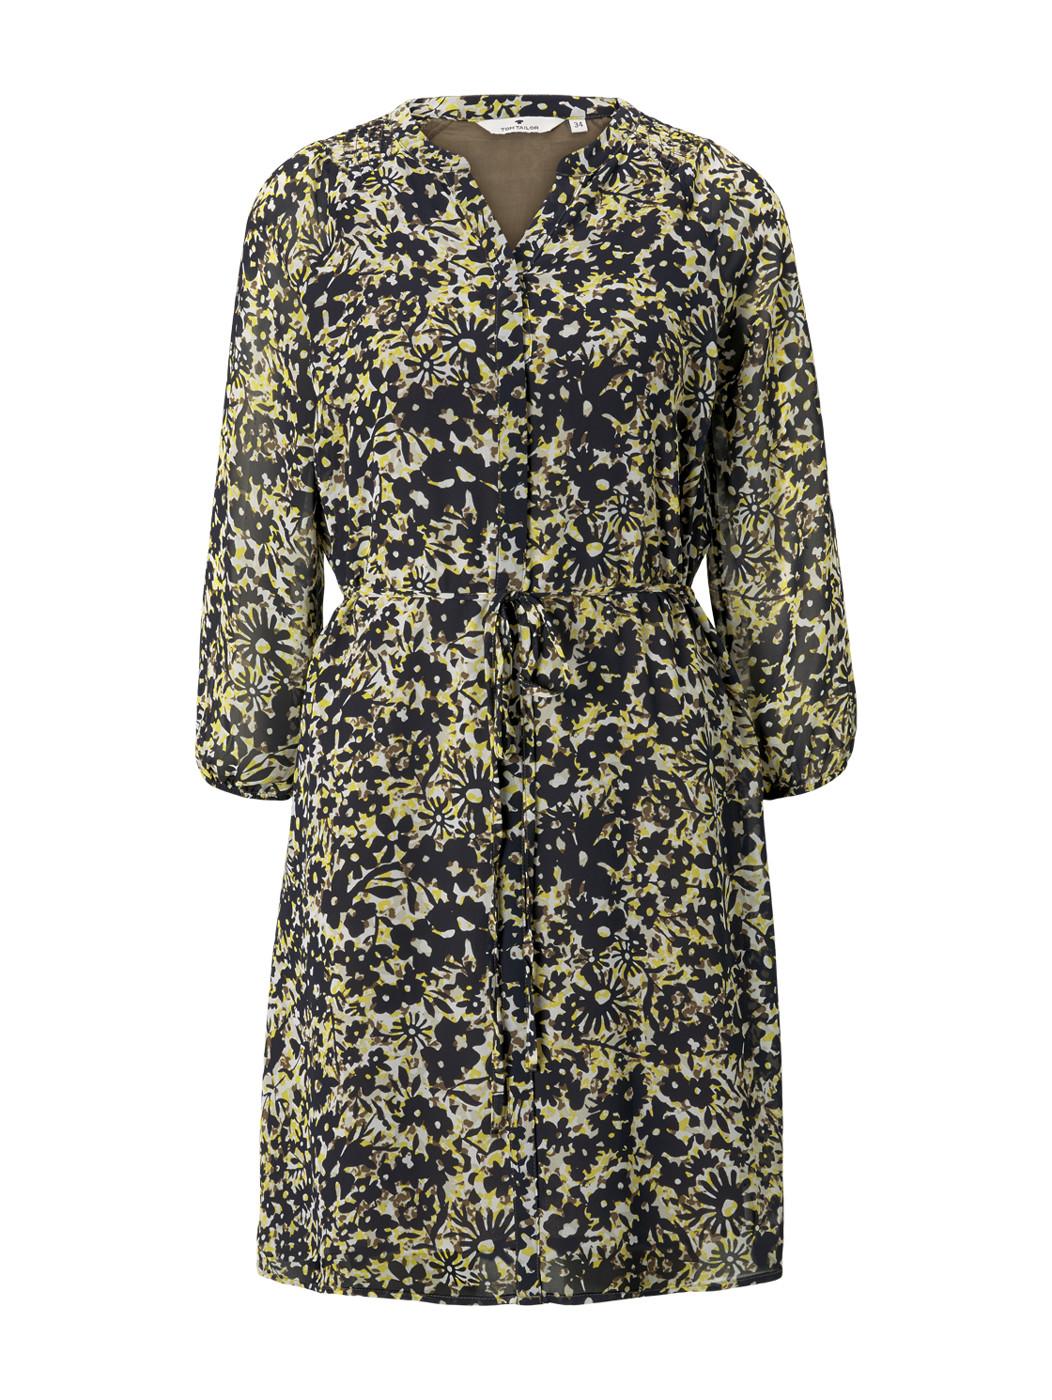 dress with smocking - Damen